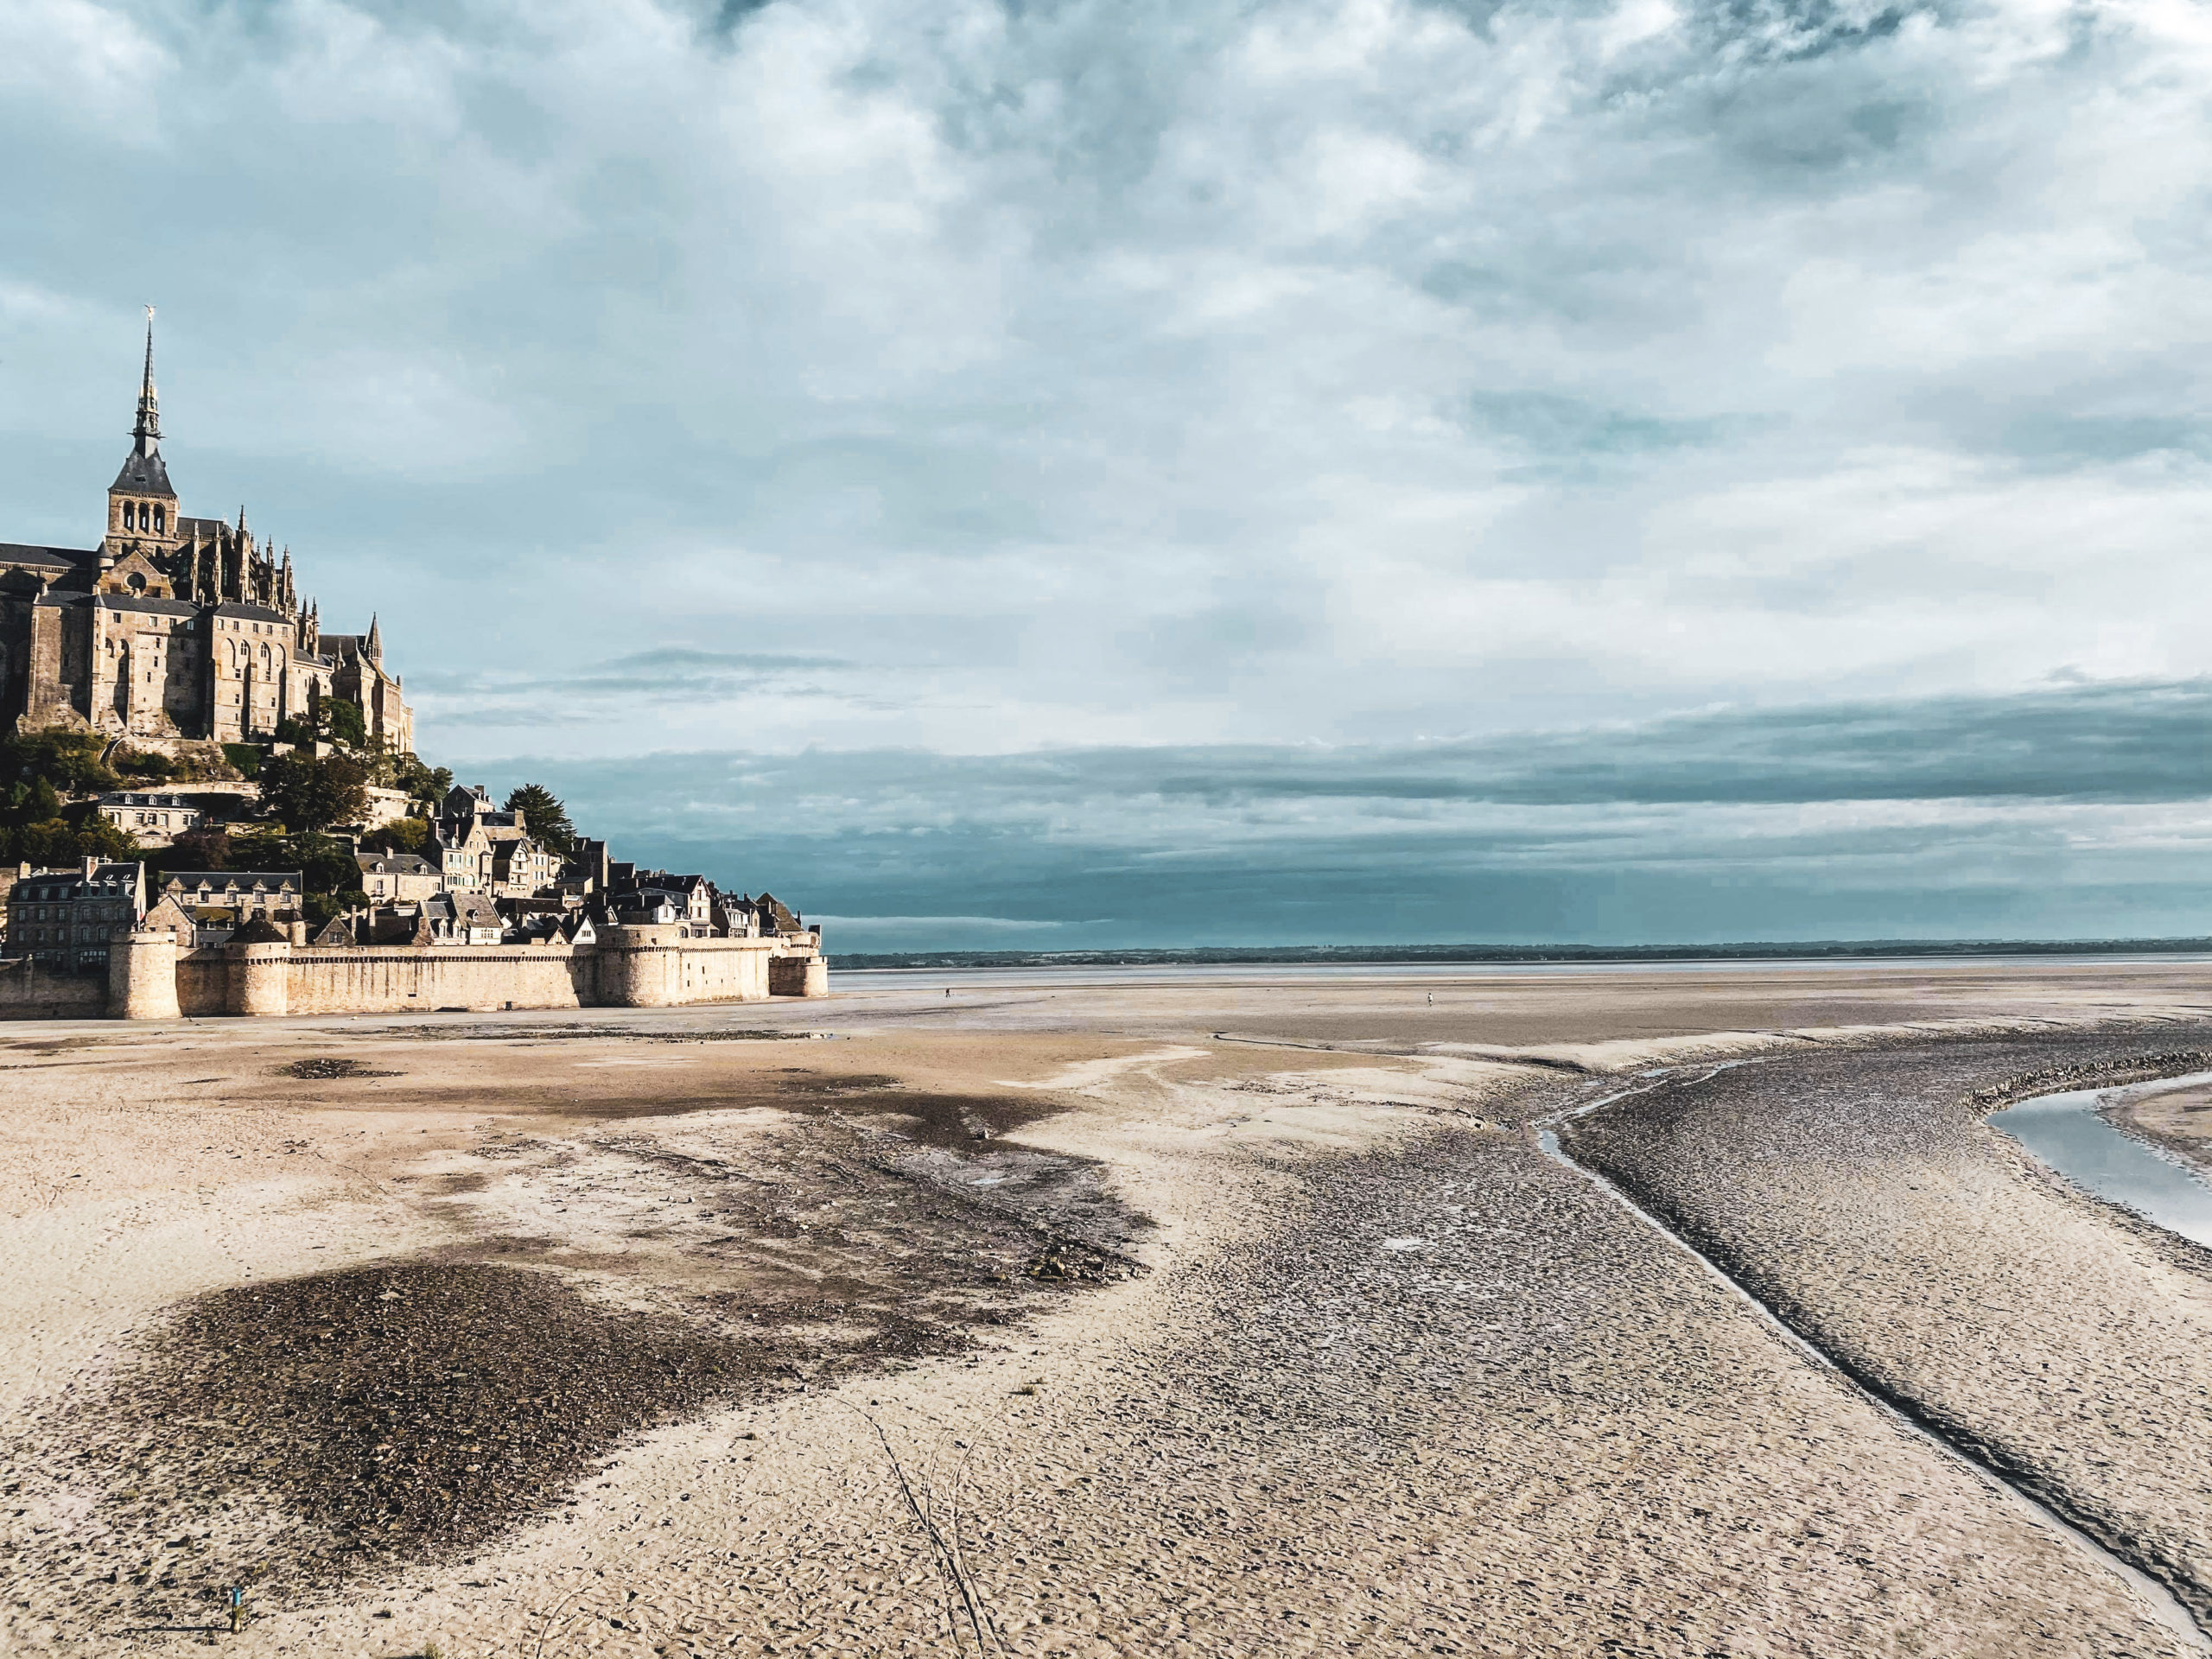 travelnote reisblog normandië - mont saint michel